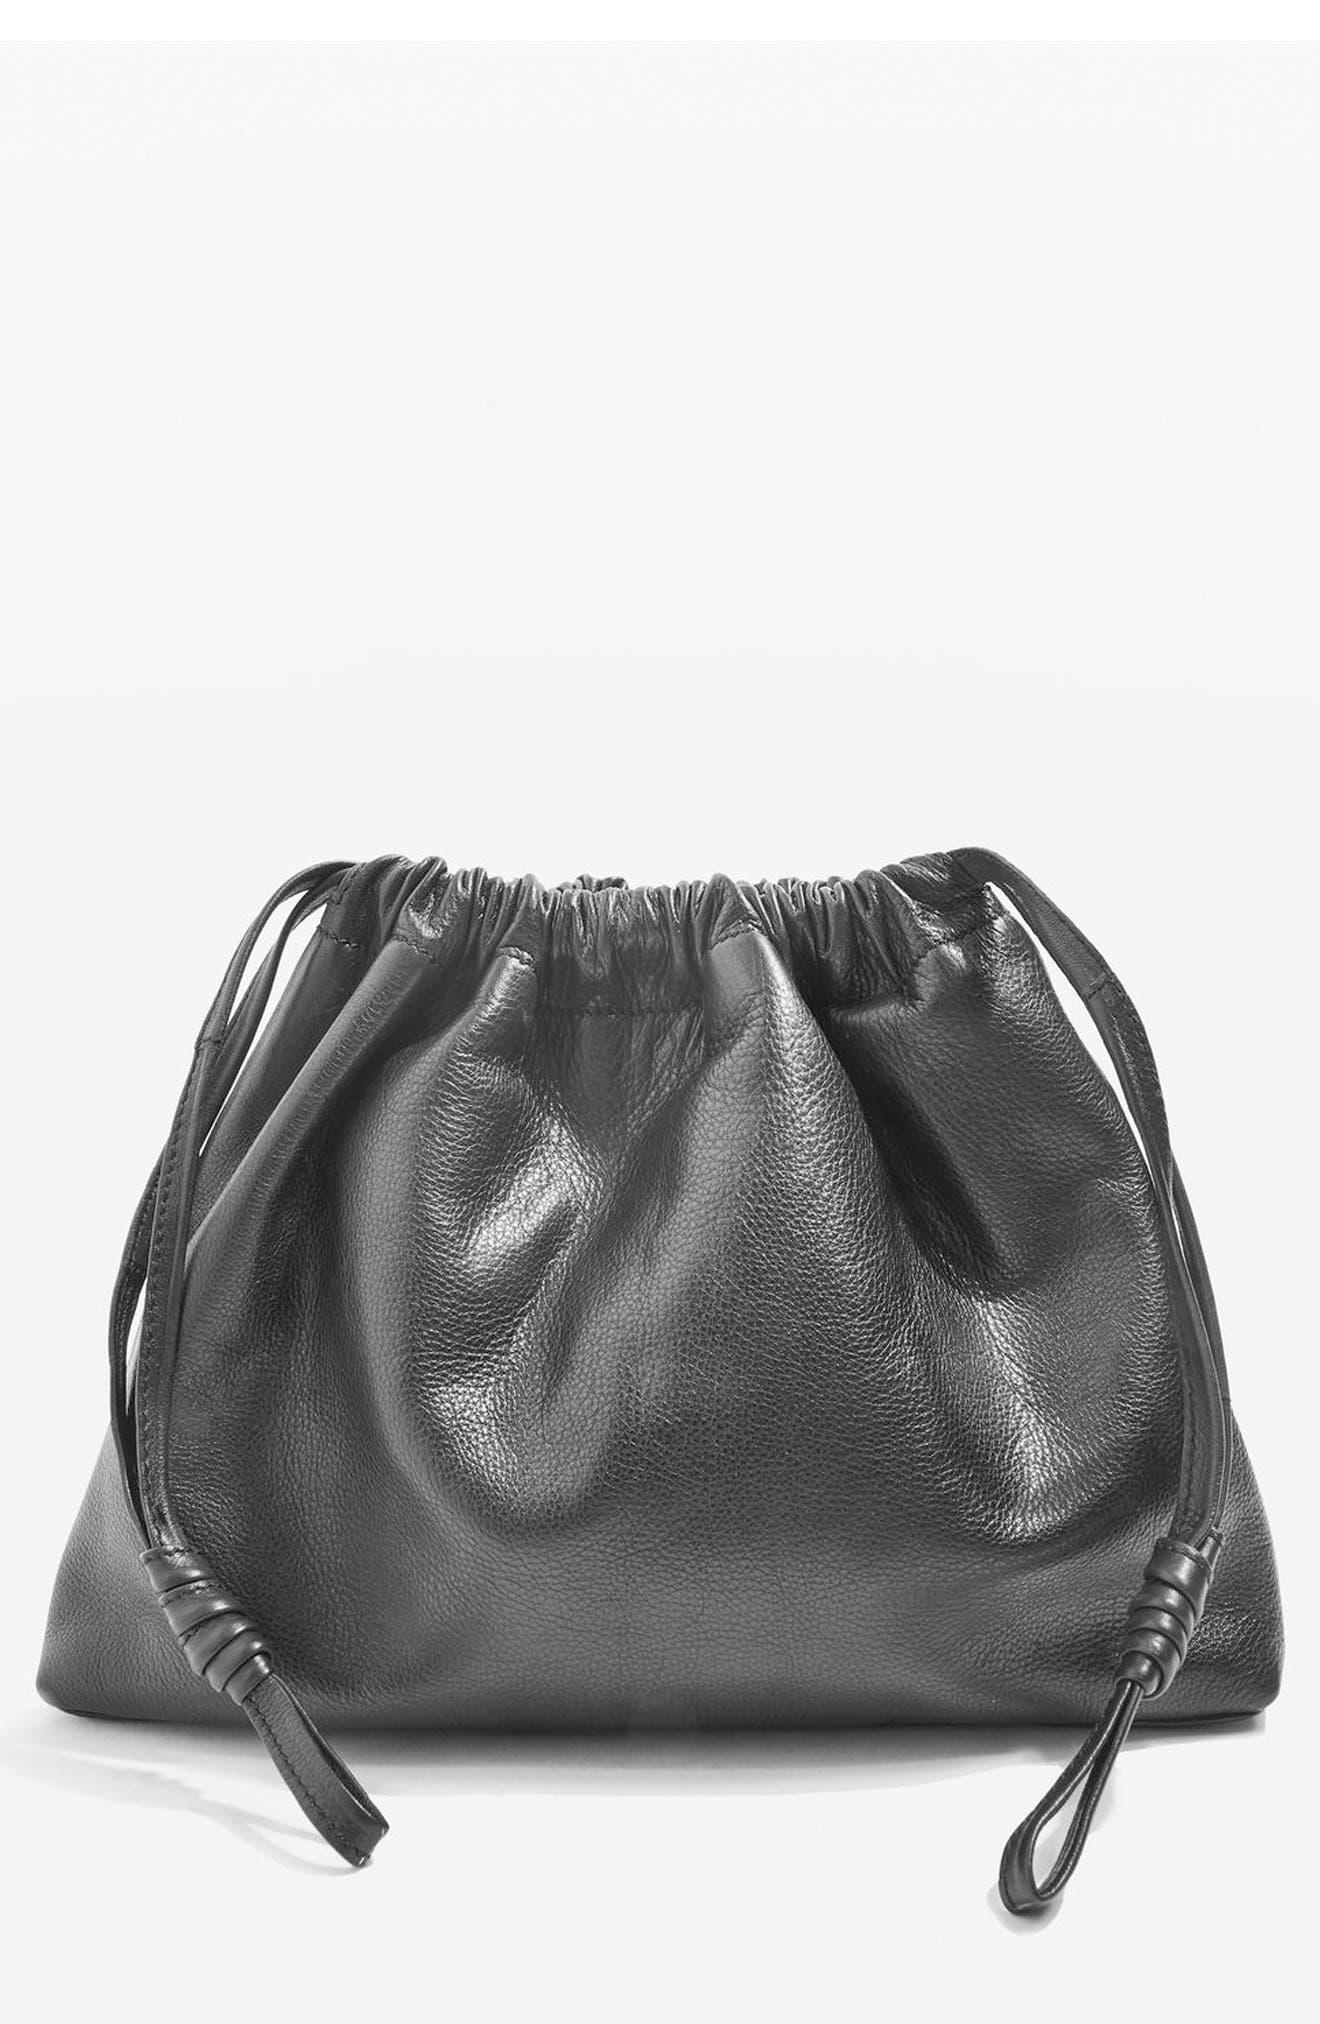 Premium Leather Drawstring Crossbody Bag,                             Main thumbnail 1, color,                             001